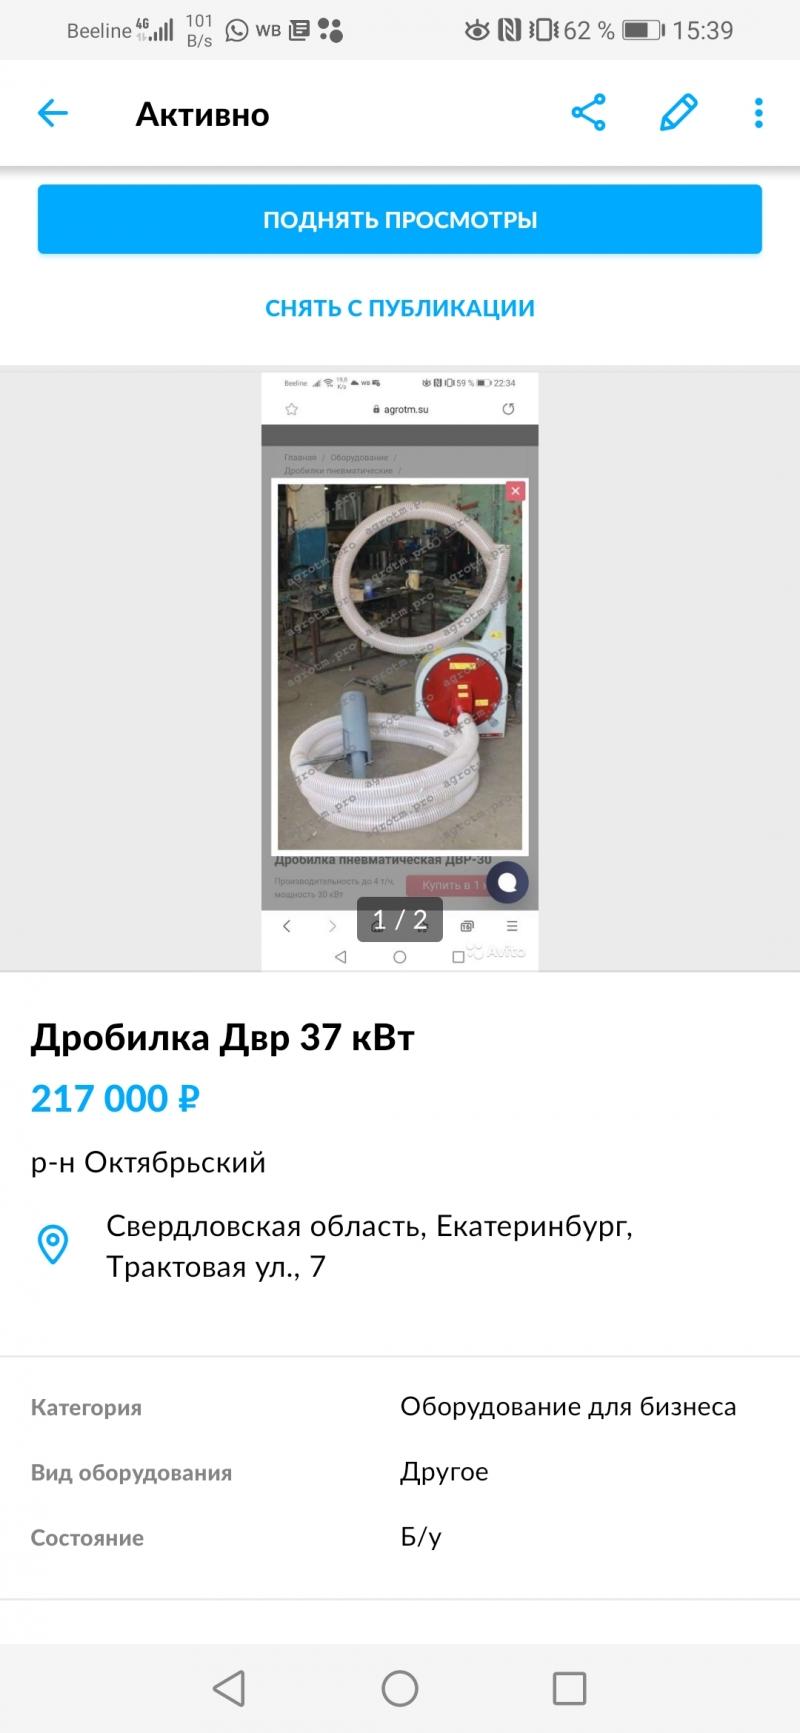 Дробилка Двр 37кВт